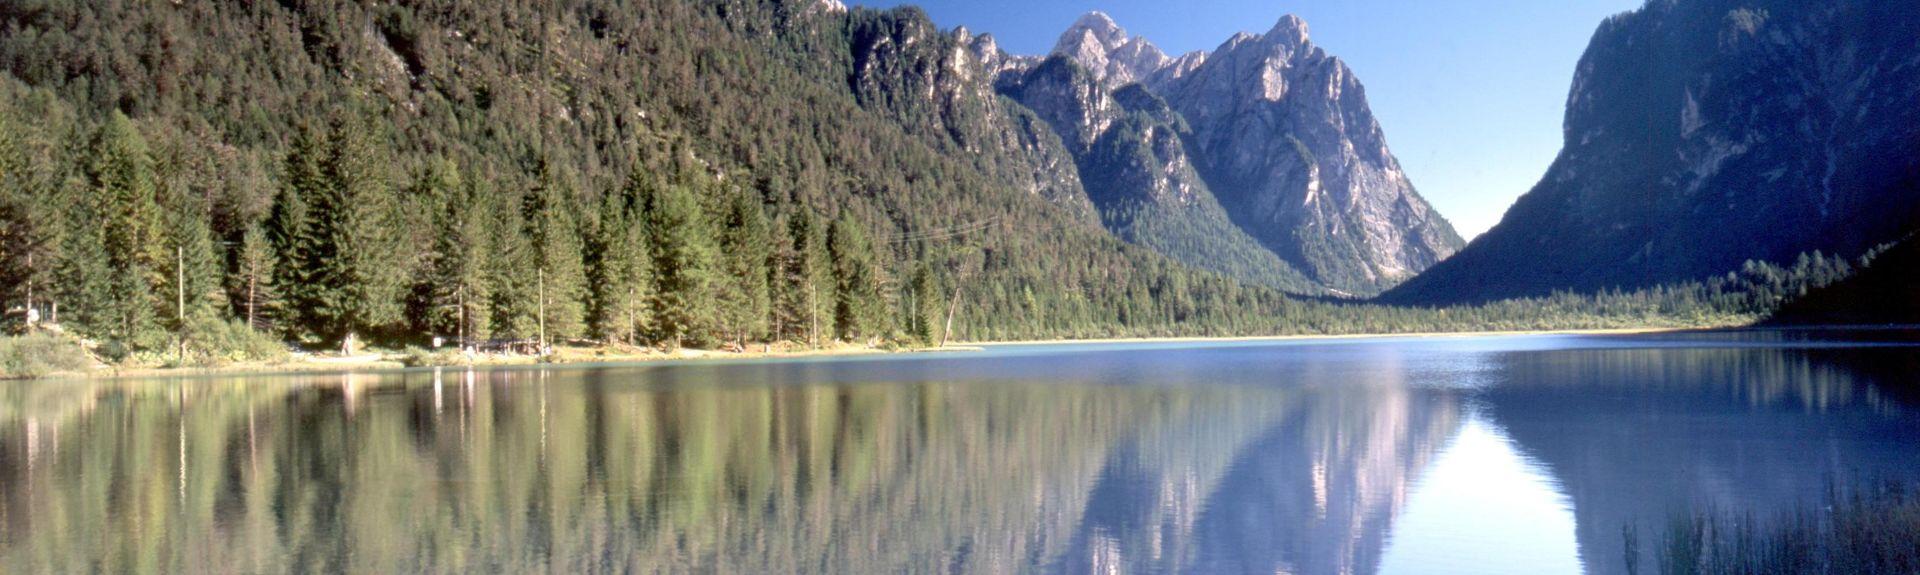 Lago di Braies, Prags, Trentino-Zuid-Tirol, Italië